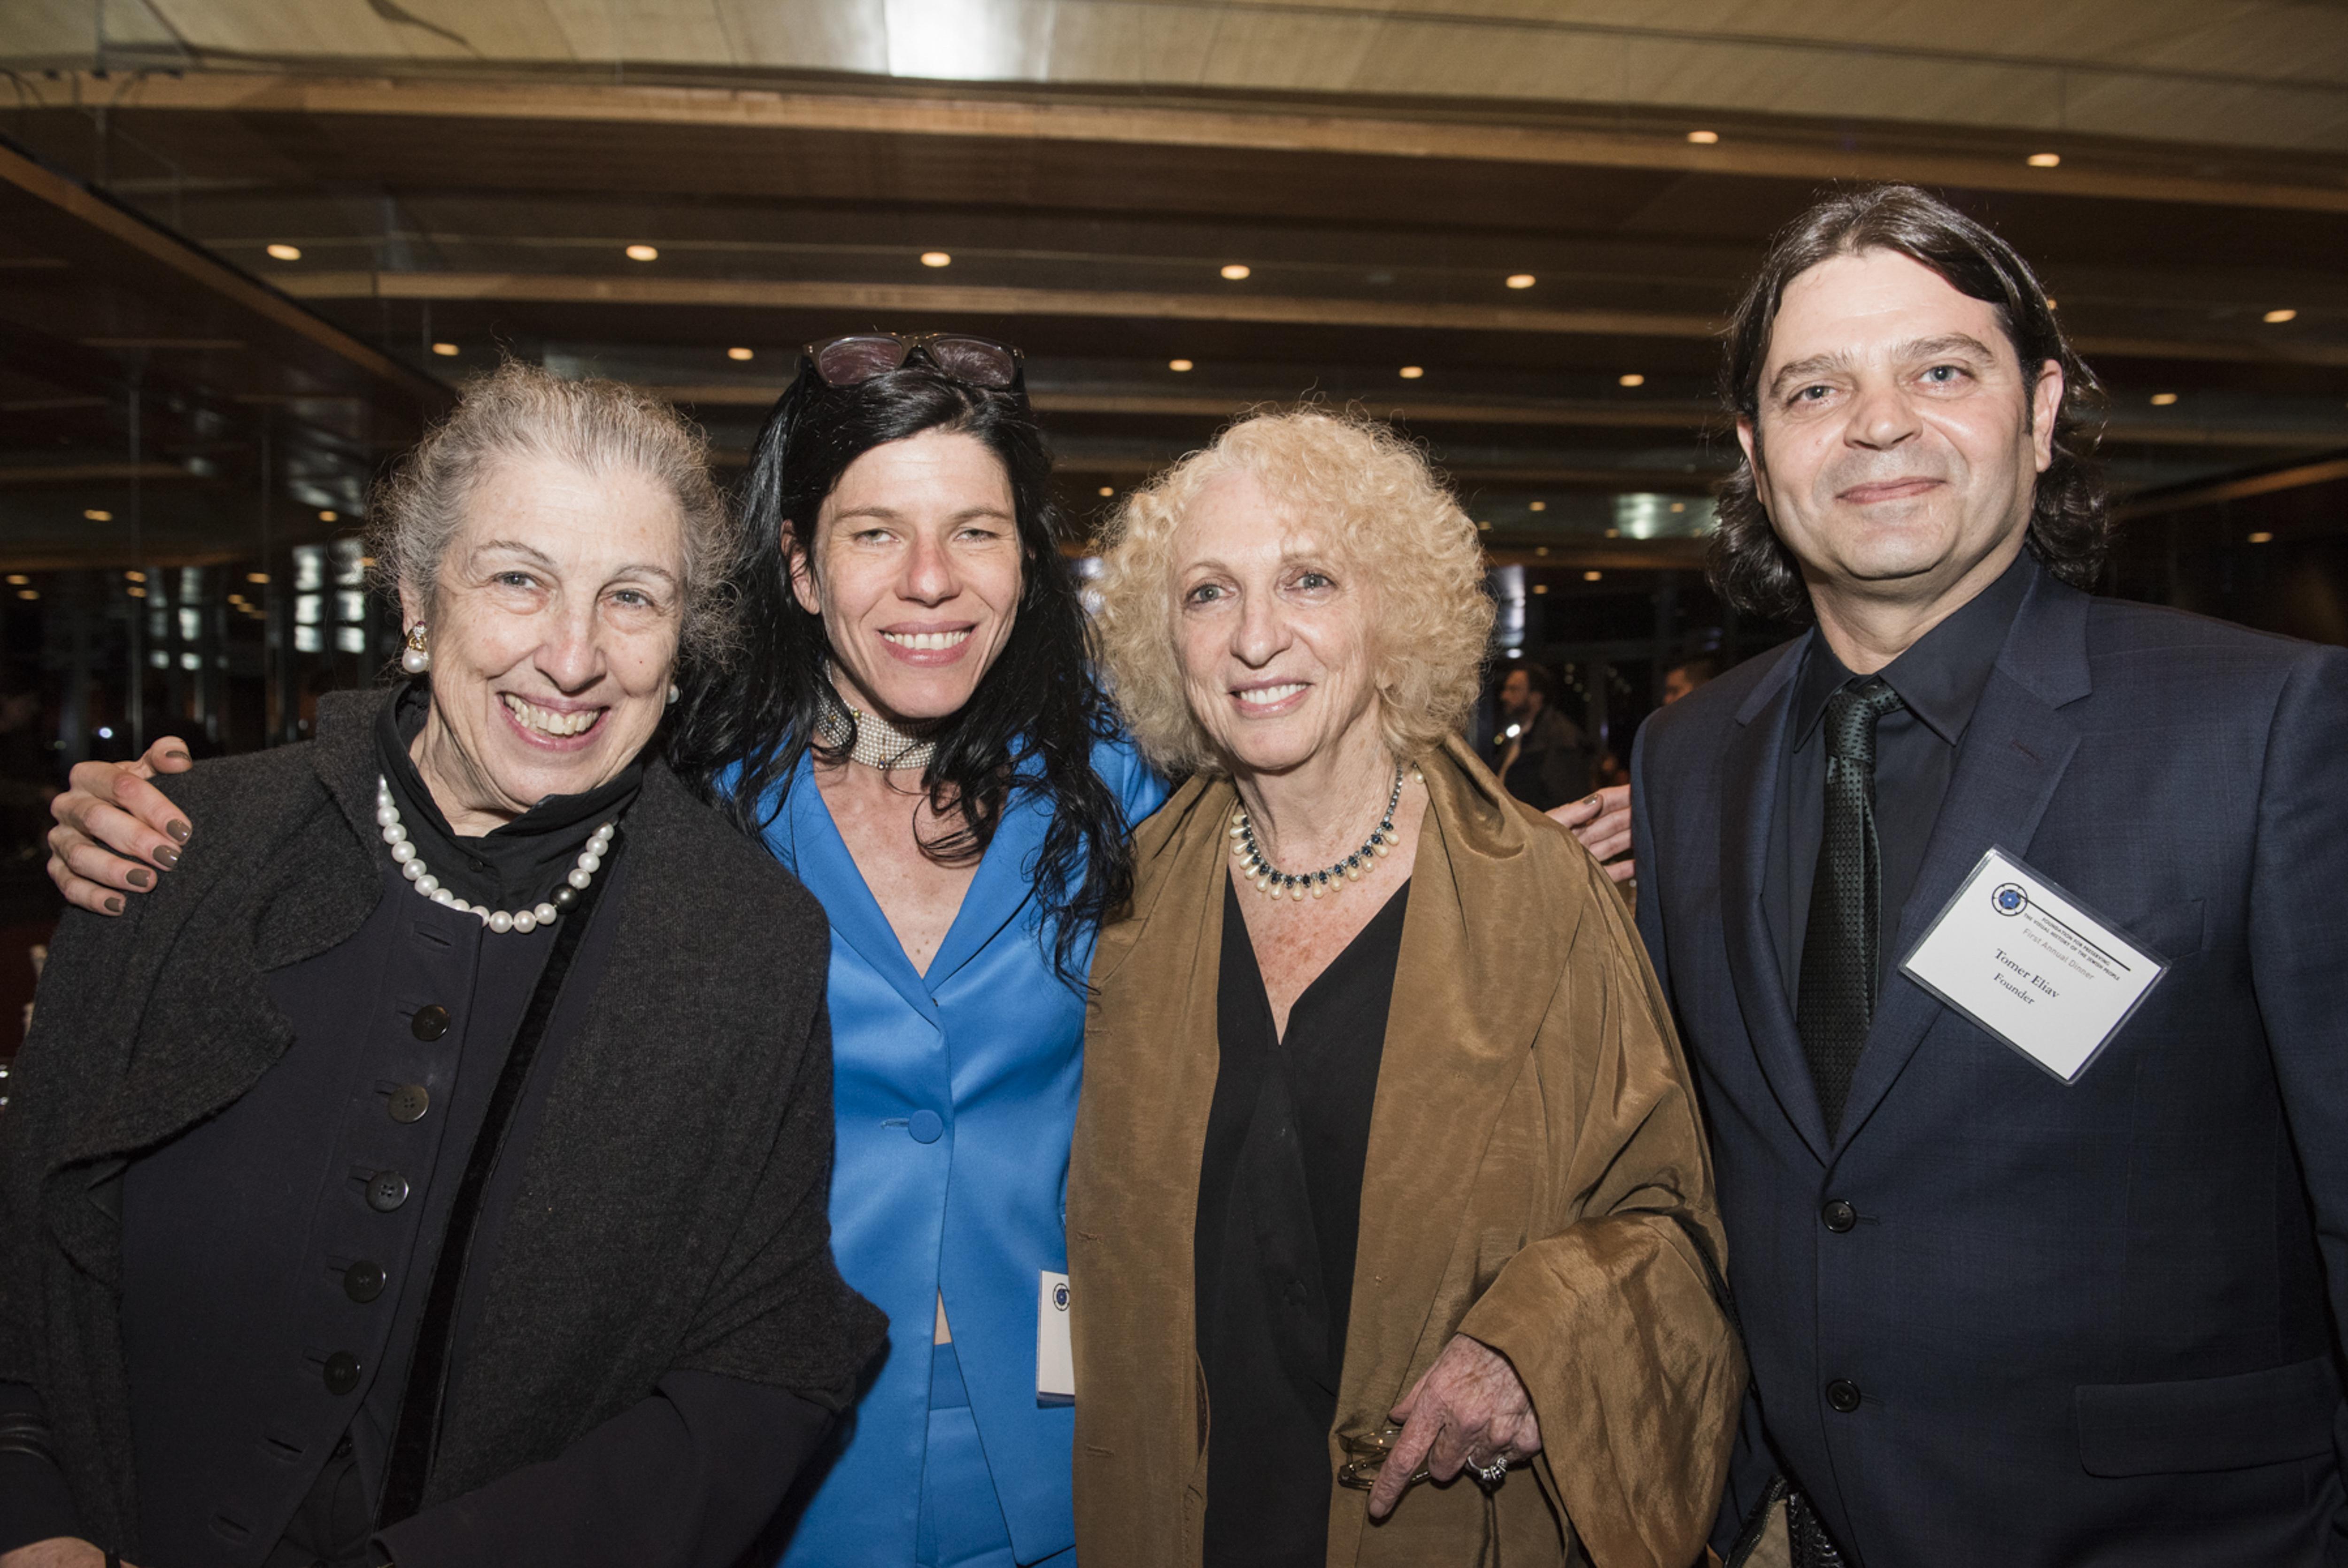 1st Annual Dinner - 305 - Patti Kenner - Vanessa Lapa - Doris Schechter - Tomer Eliav